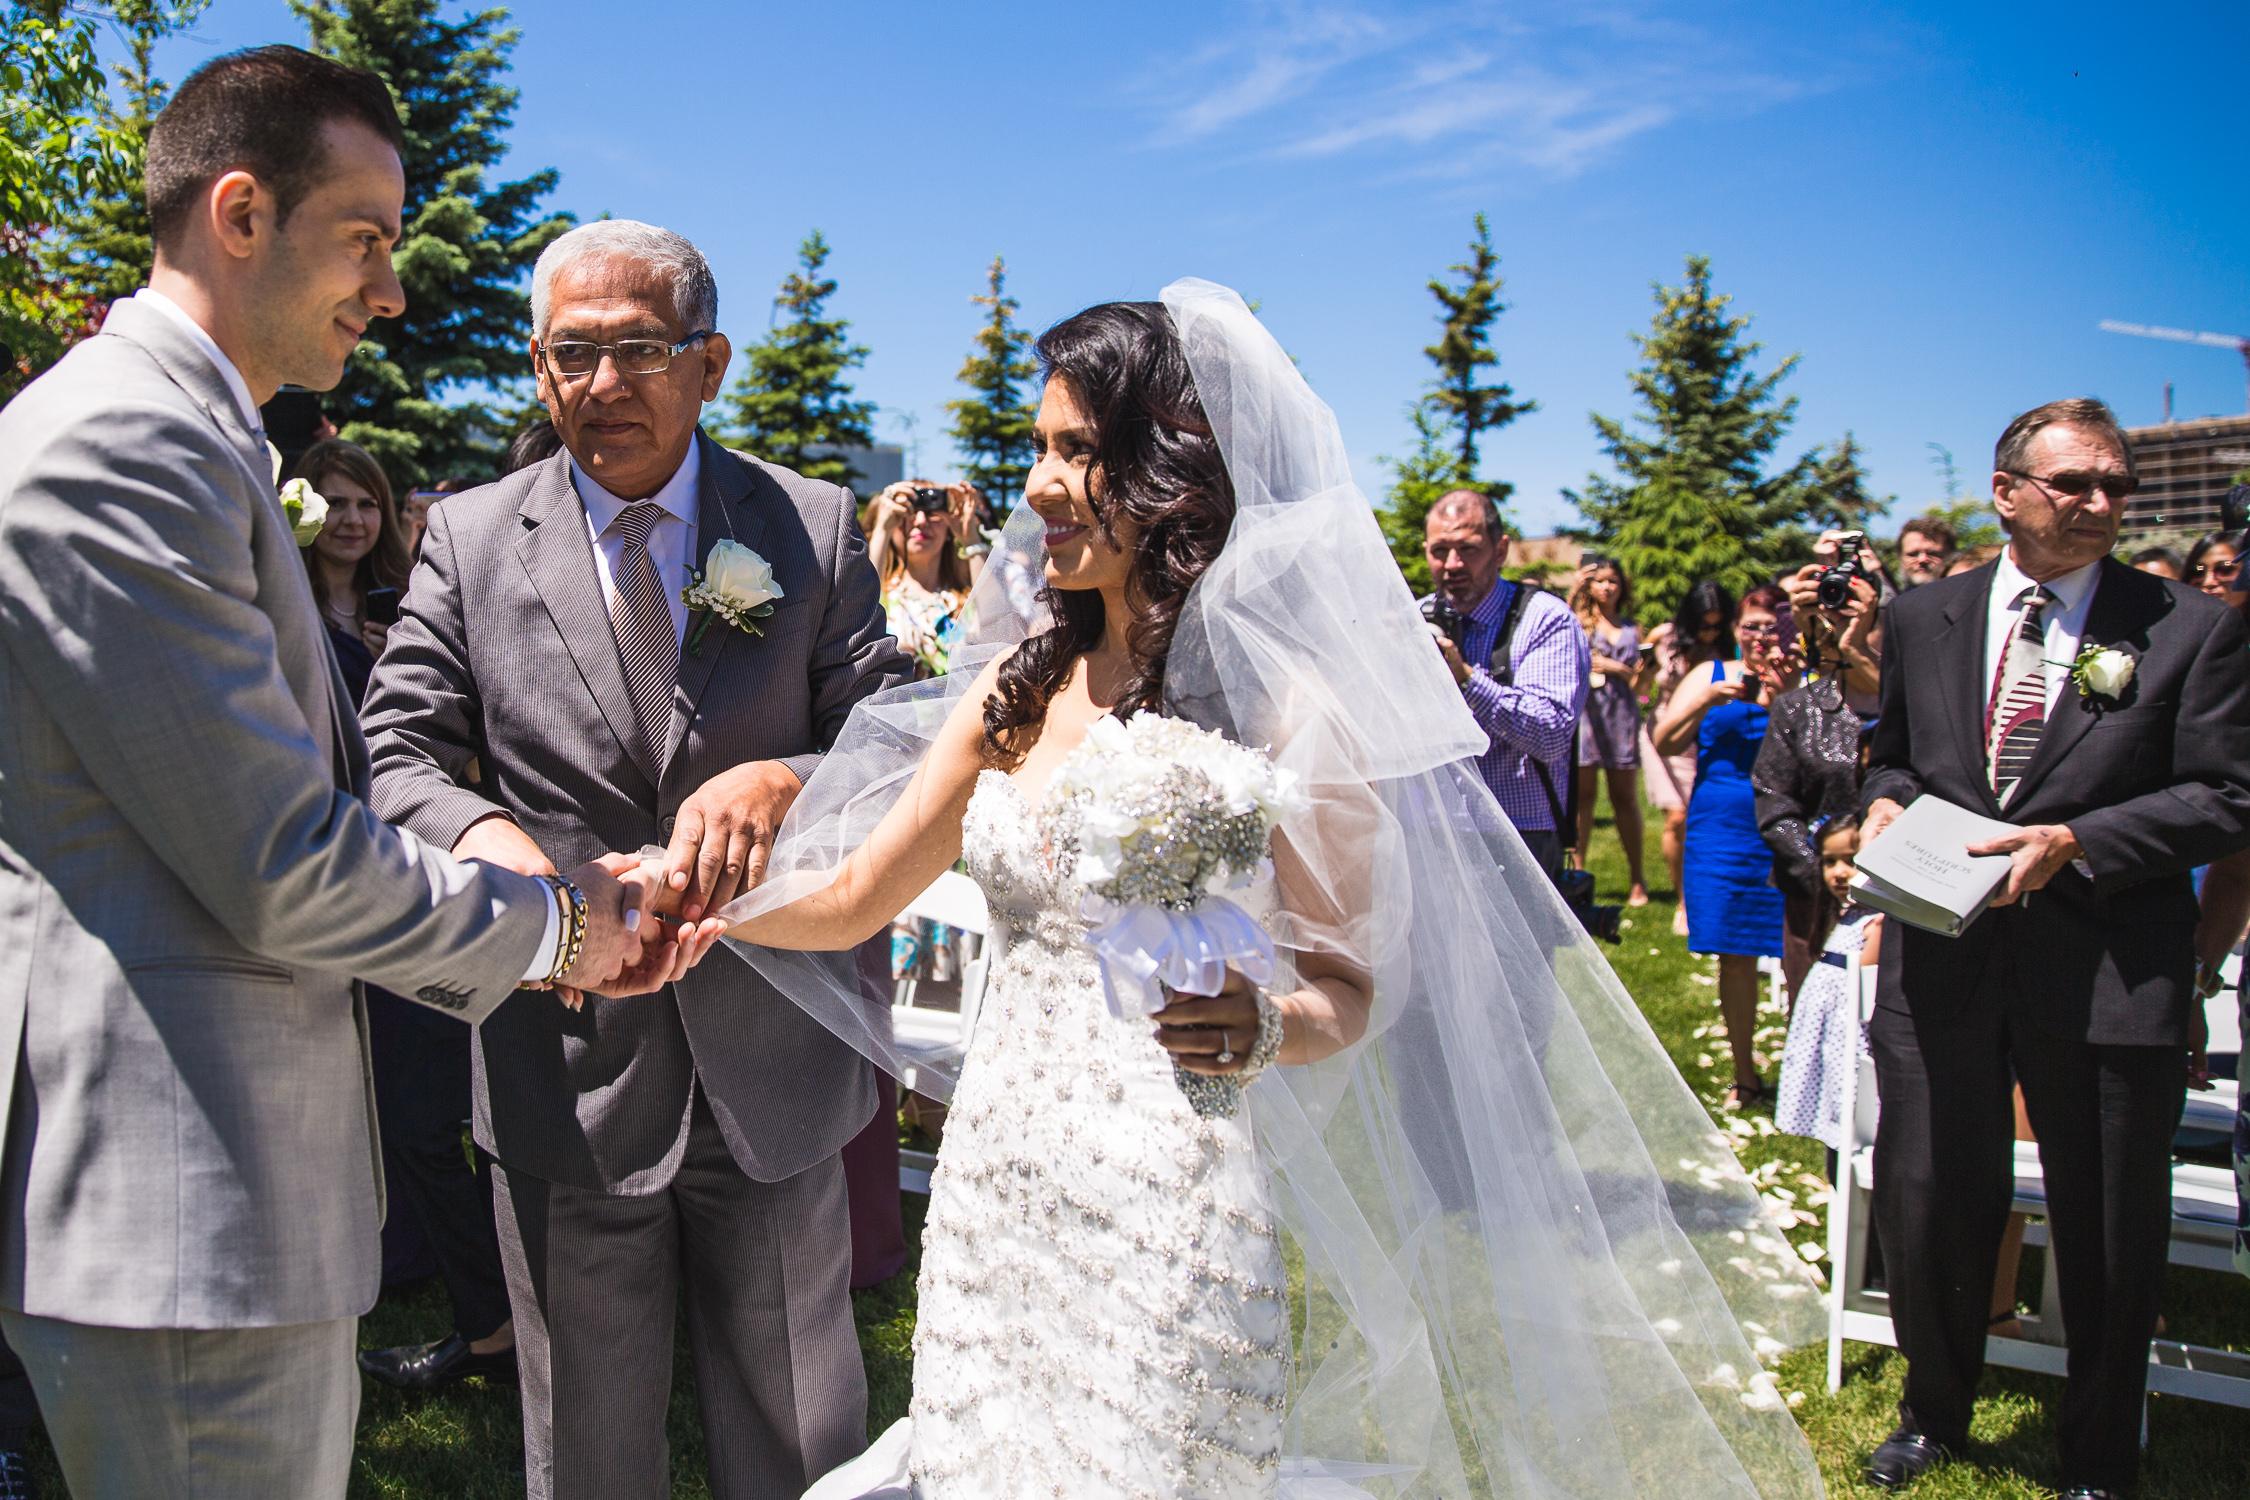 Paradise-Banquet-Hall-Wedding-Vaughan-Ontario-0040.jpg